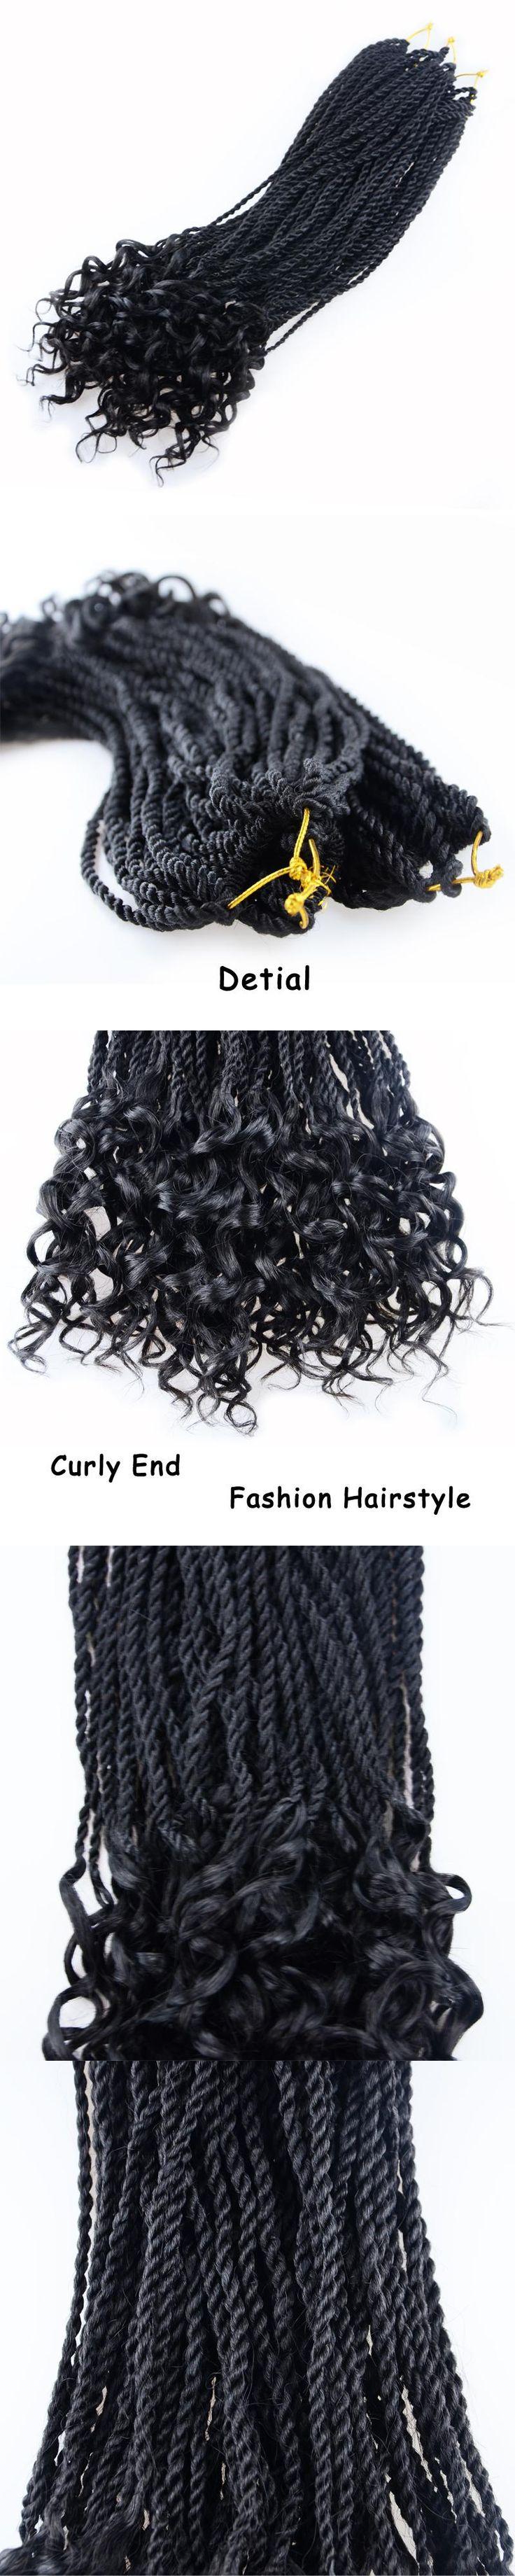 "ELEGANT MUSES 18"" 30R 100g Twist Braiding Hair Extensions Crochet Braids Senegalese Twist Crochet Hair Extensions Synthetic 1pc"